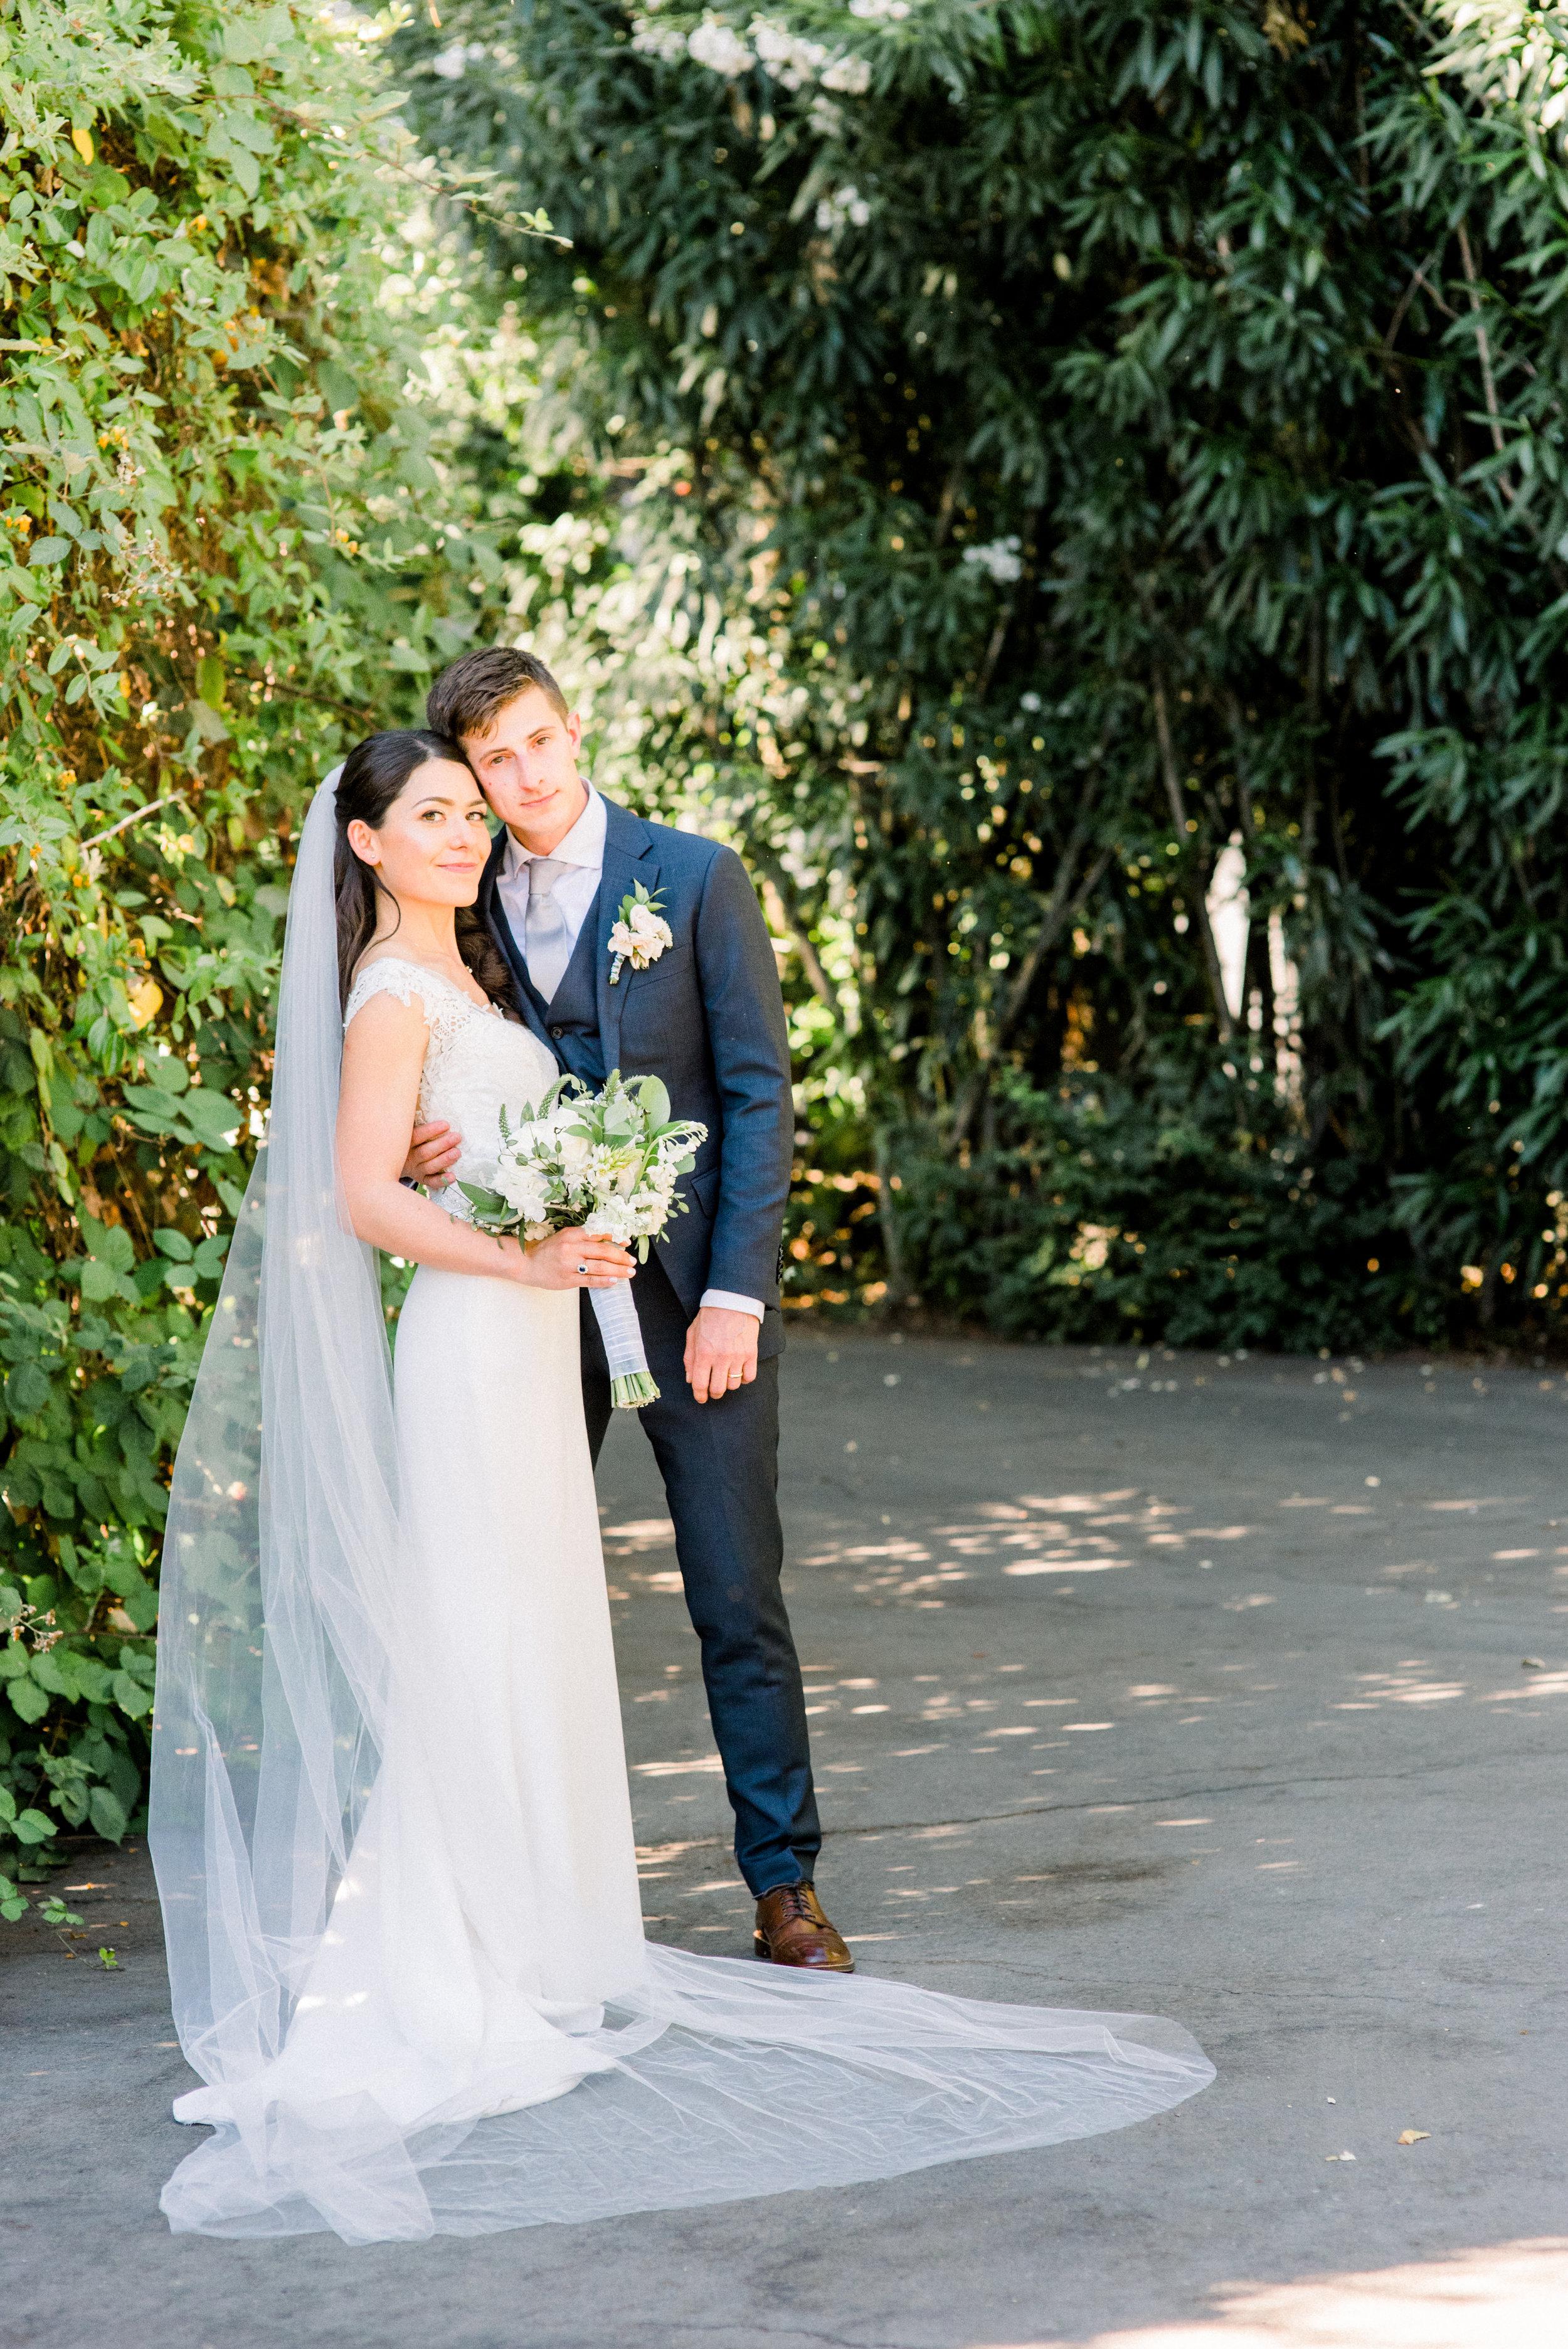 Derek&Marian-357.jpg